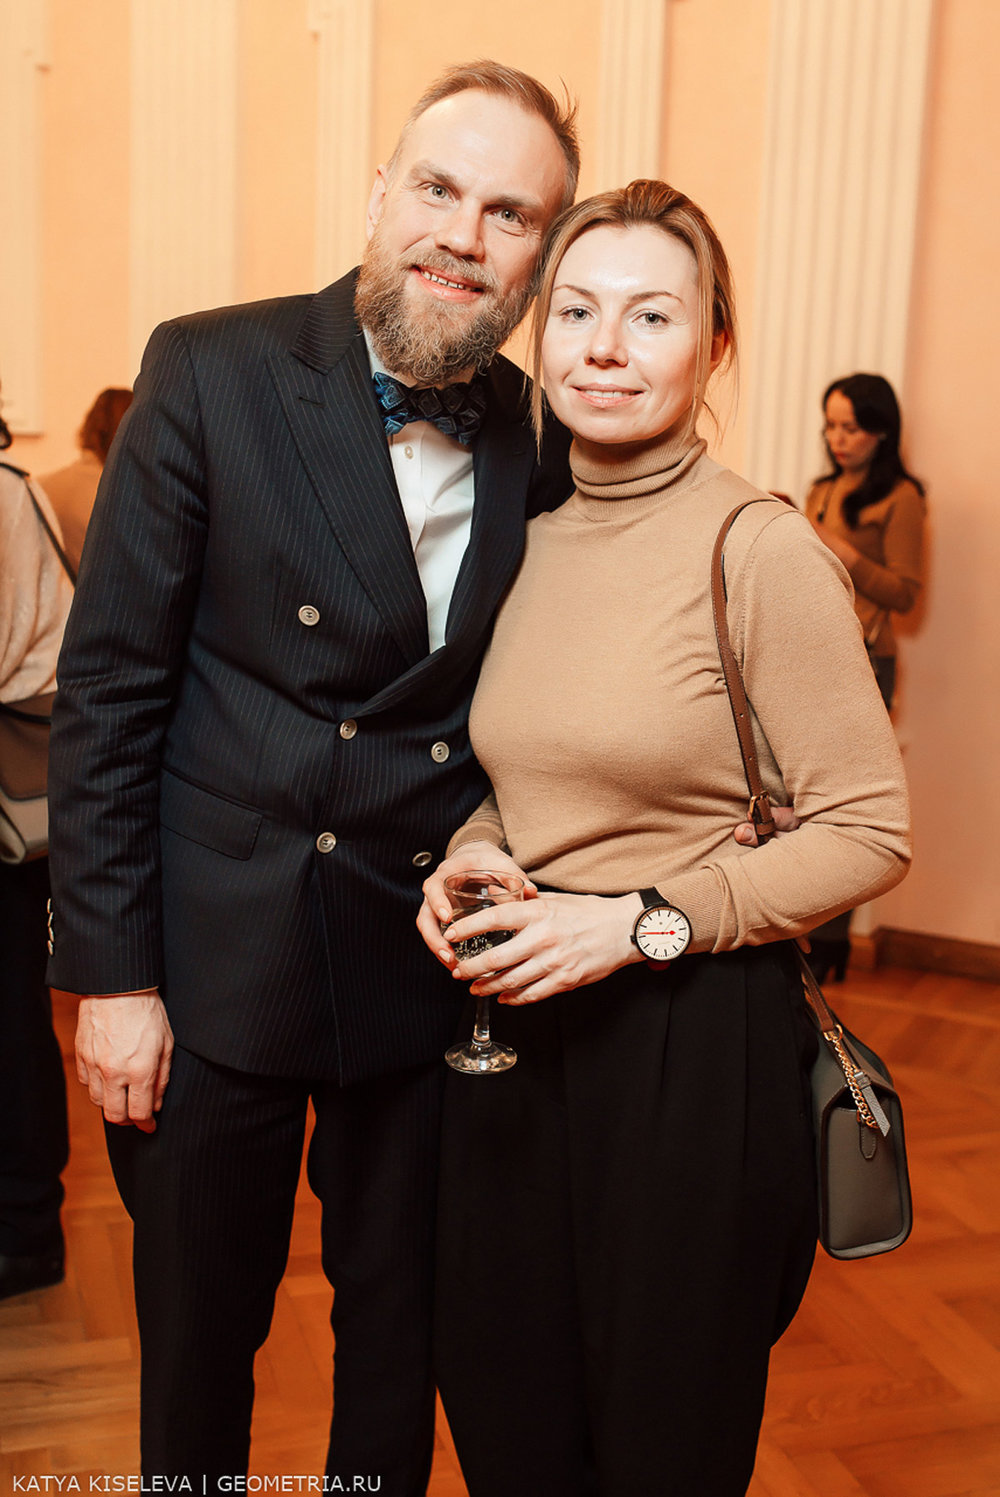 113_2018-02-14_19-10-10_Kiseleva.jpg